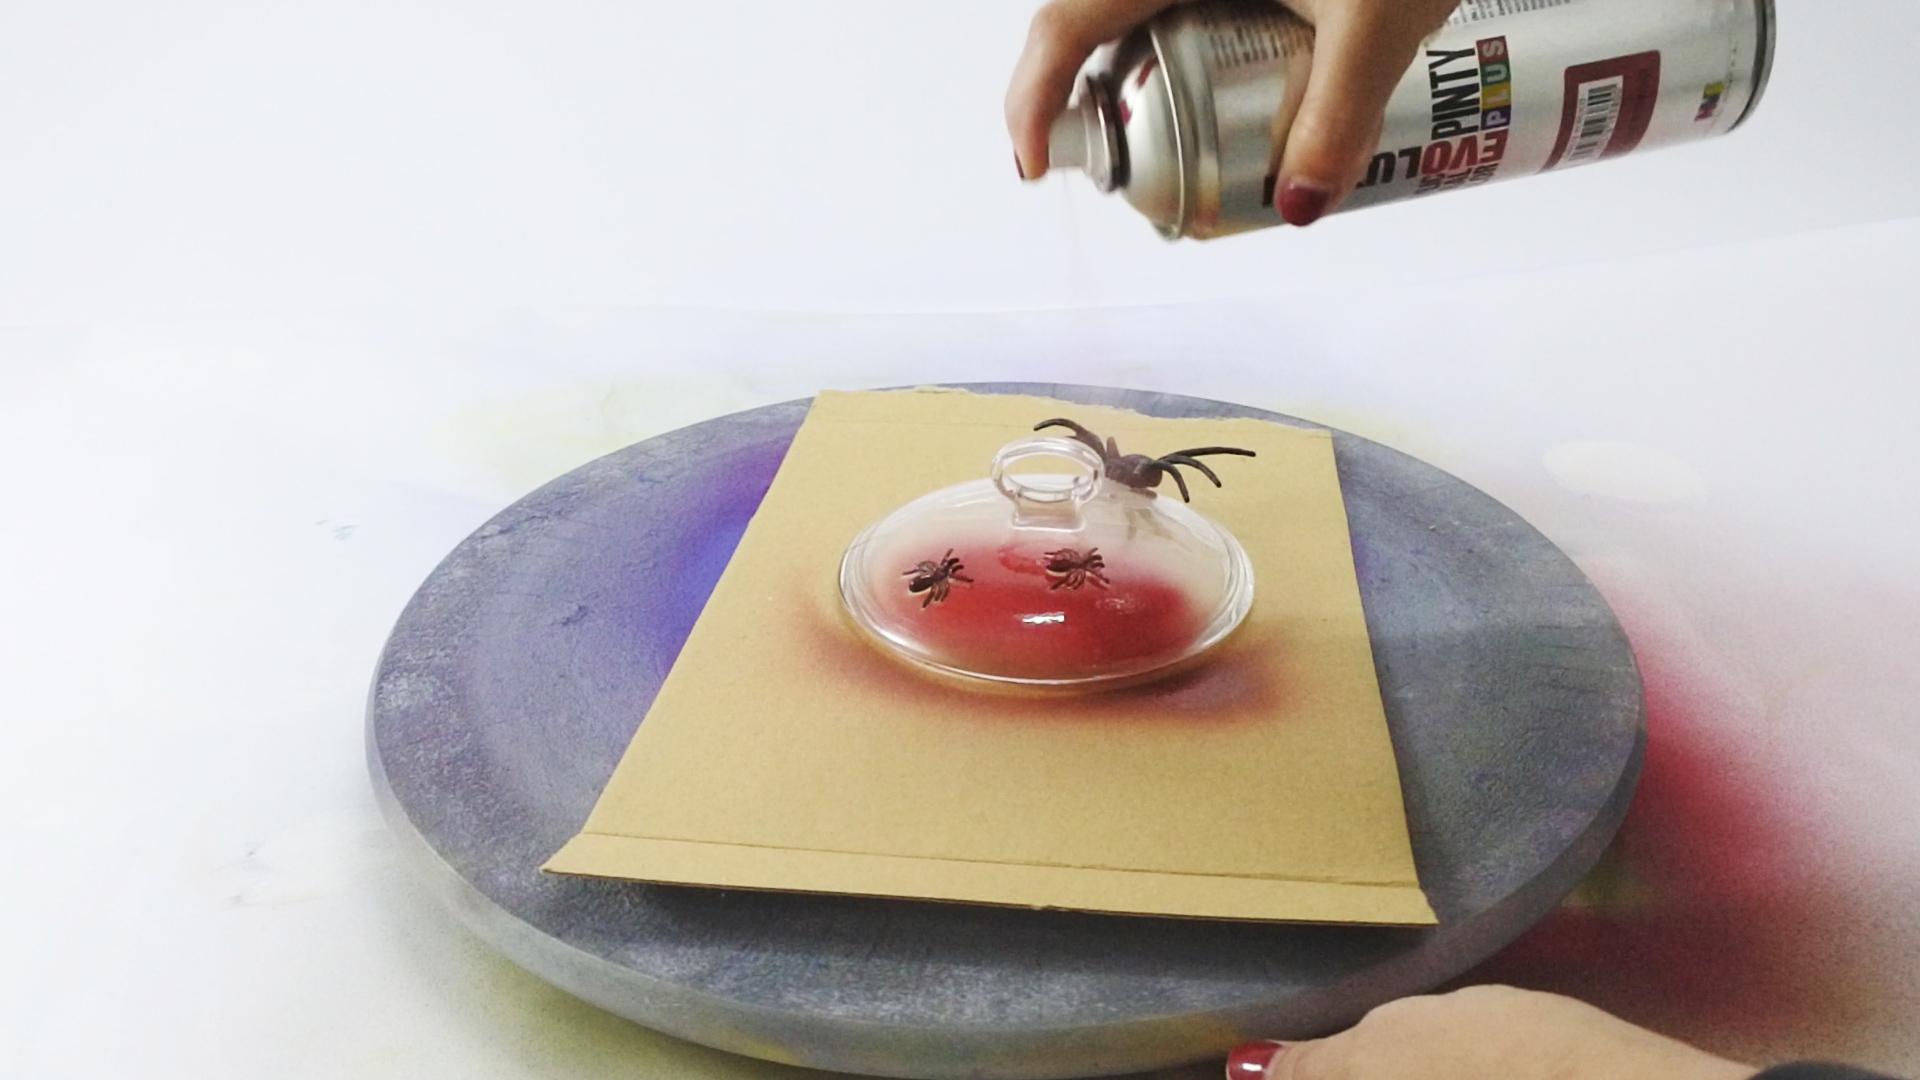 DIY BOMBONERAS HALLOWEEN.00_00_50_02.Imagen fija019